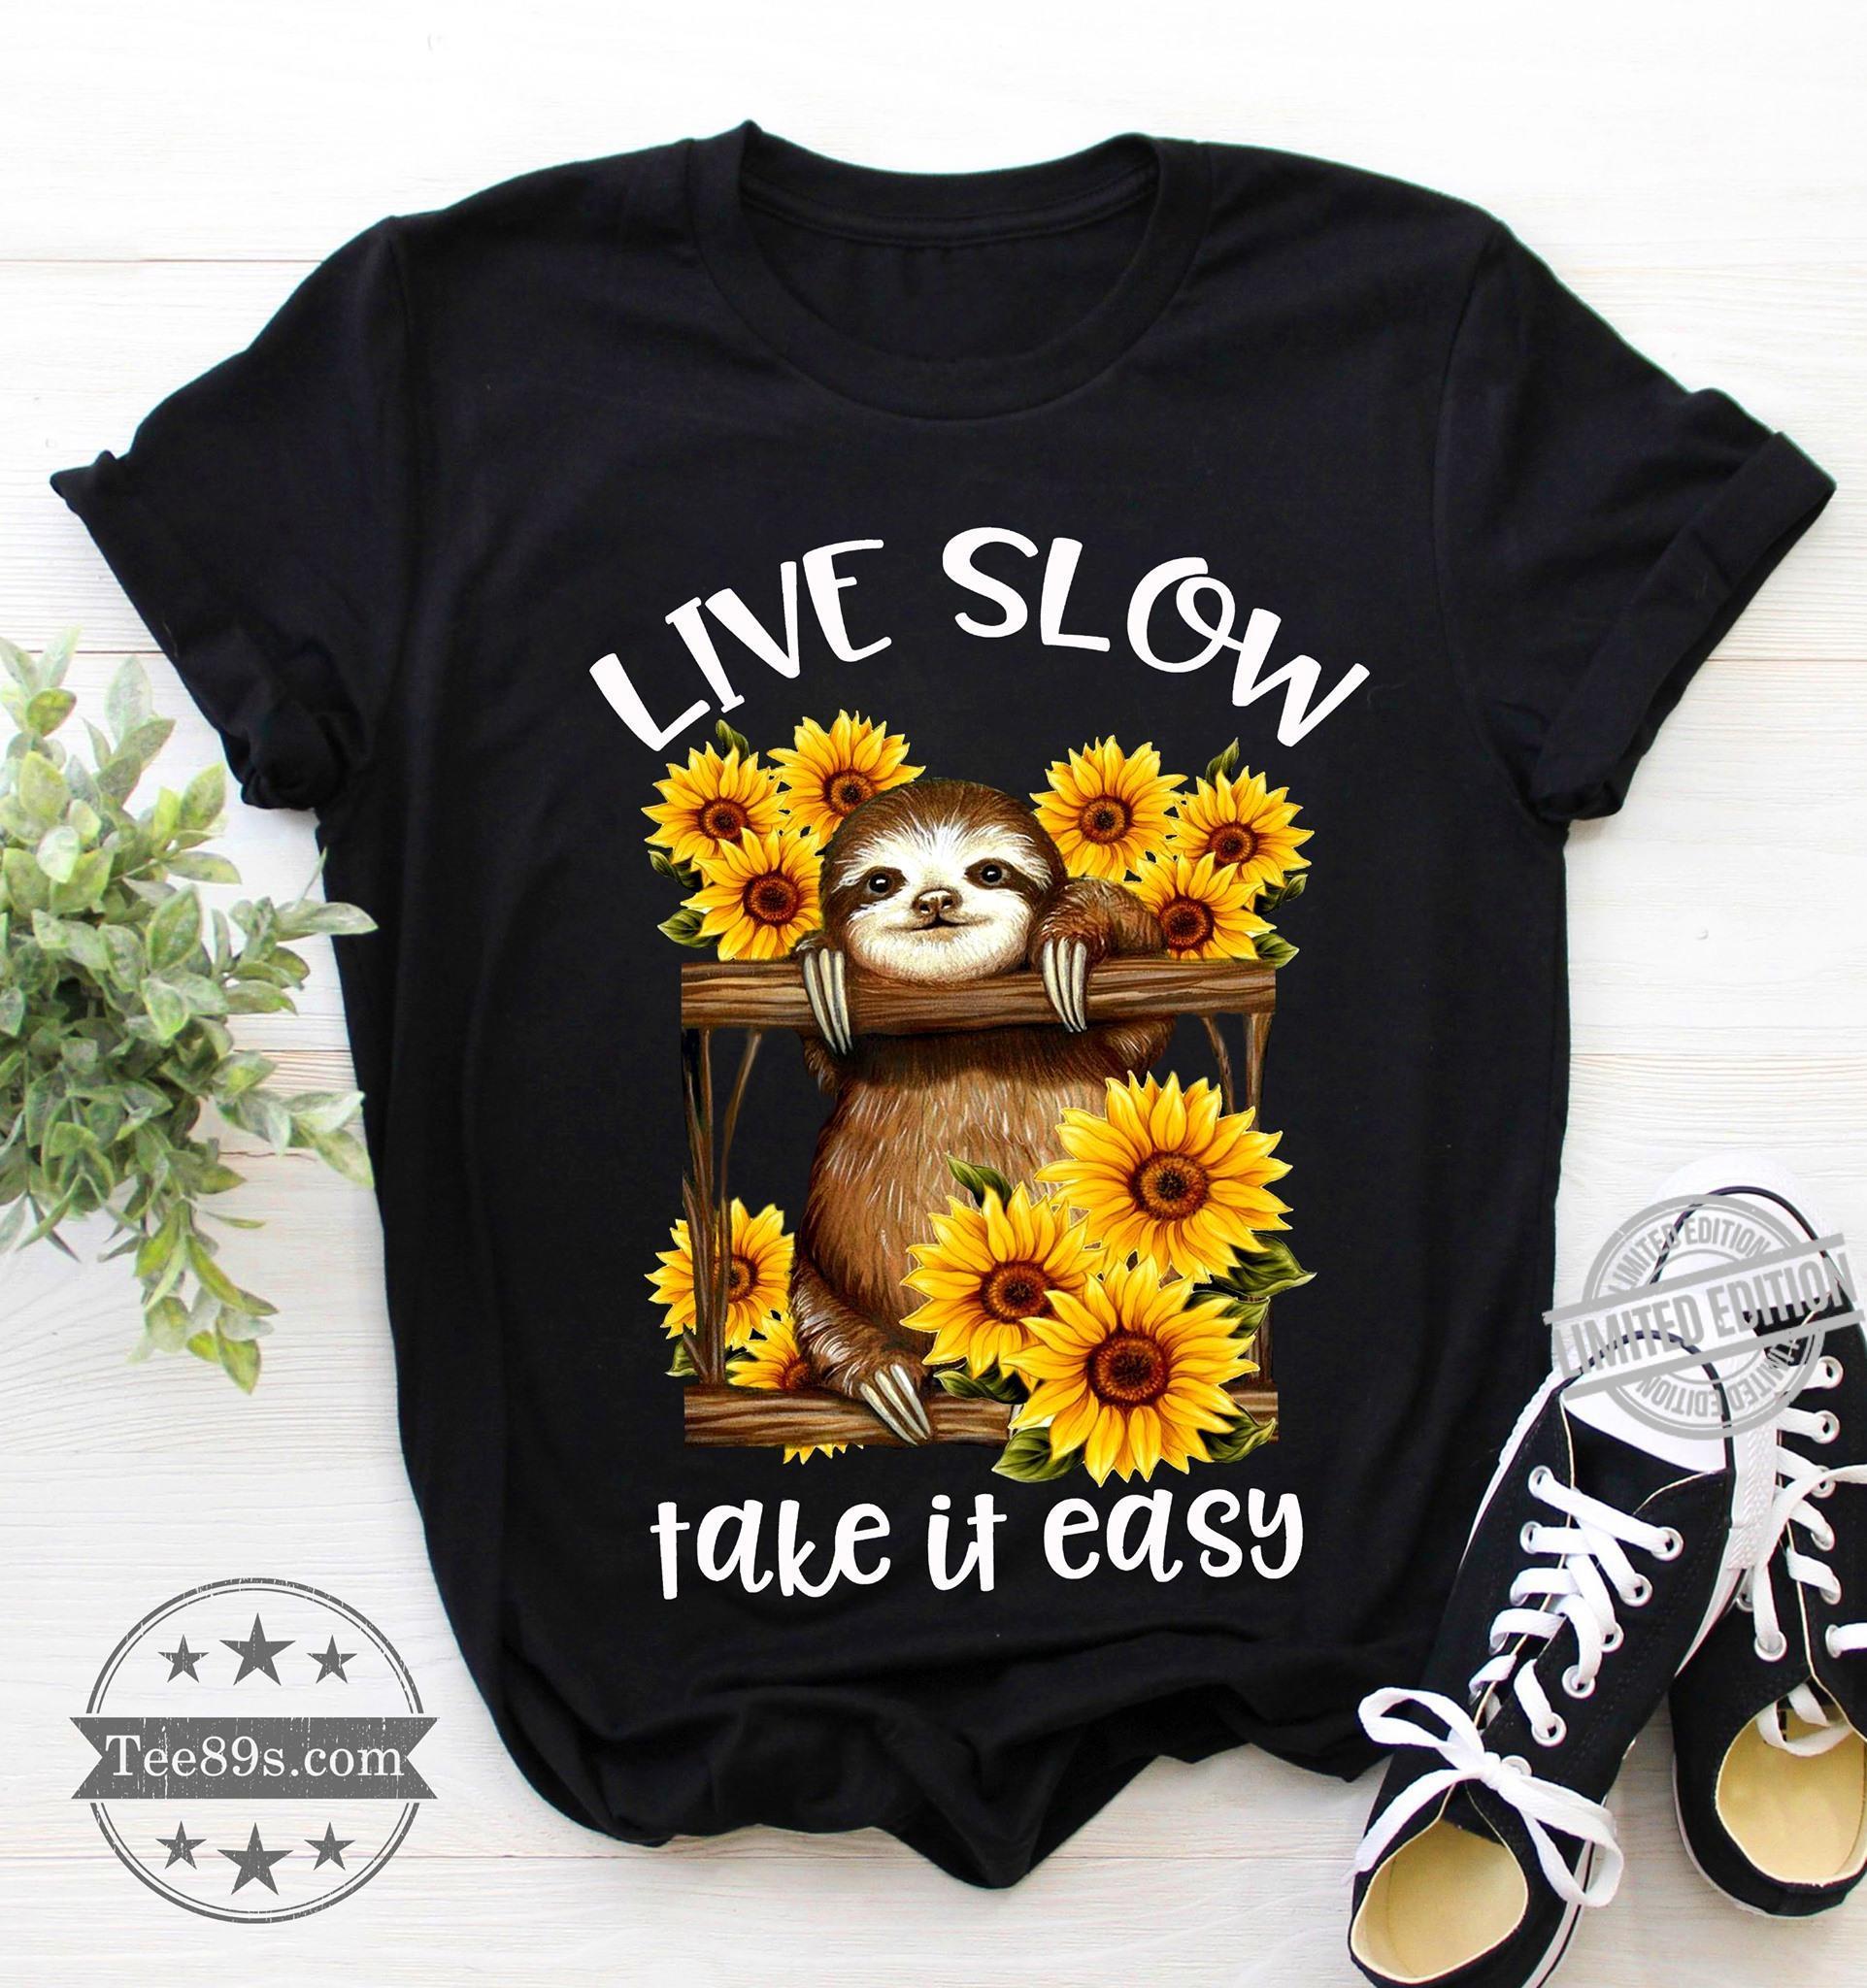 Live Slow Take It Easy Shirt